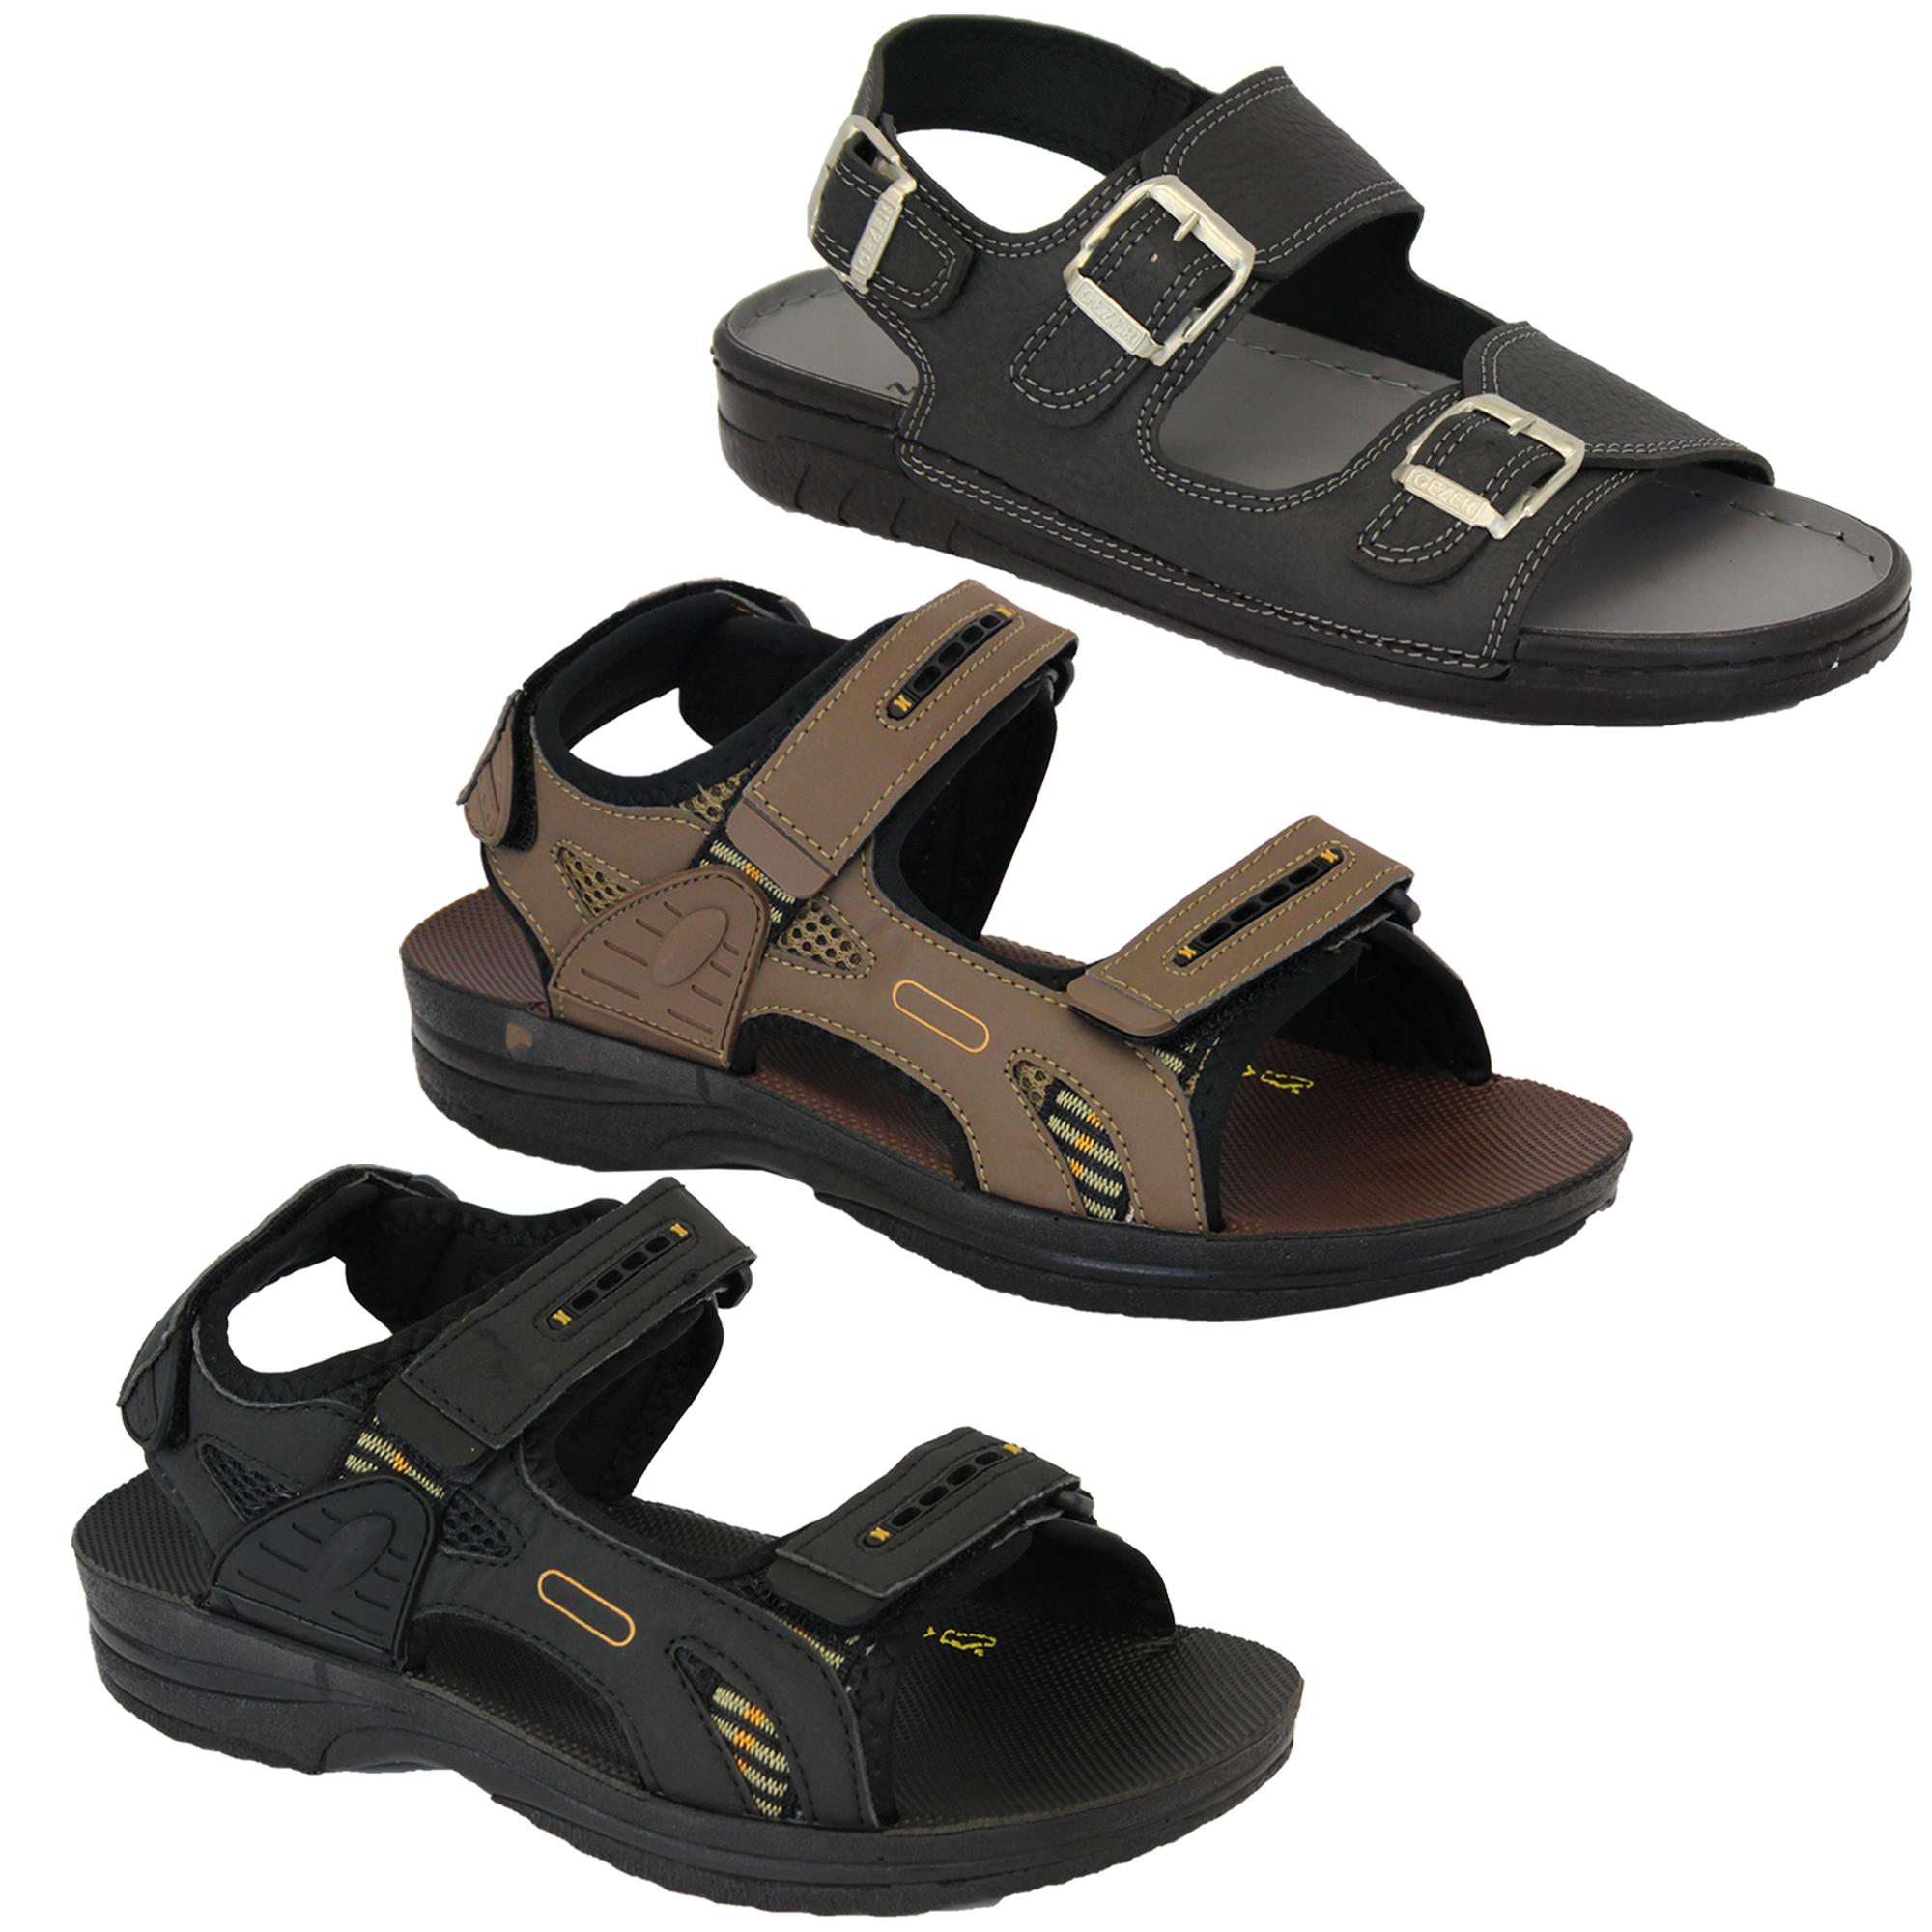 bc7e0532fad Mens Sandals Buckle Velcro Open Toe Walking Outdoor Beach Holiday ...